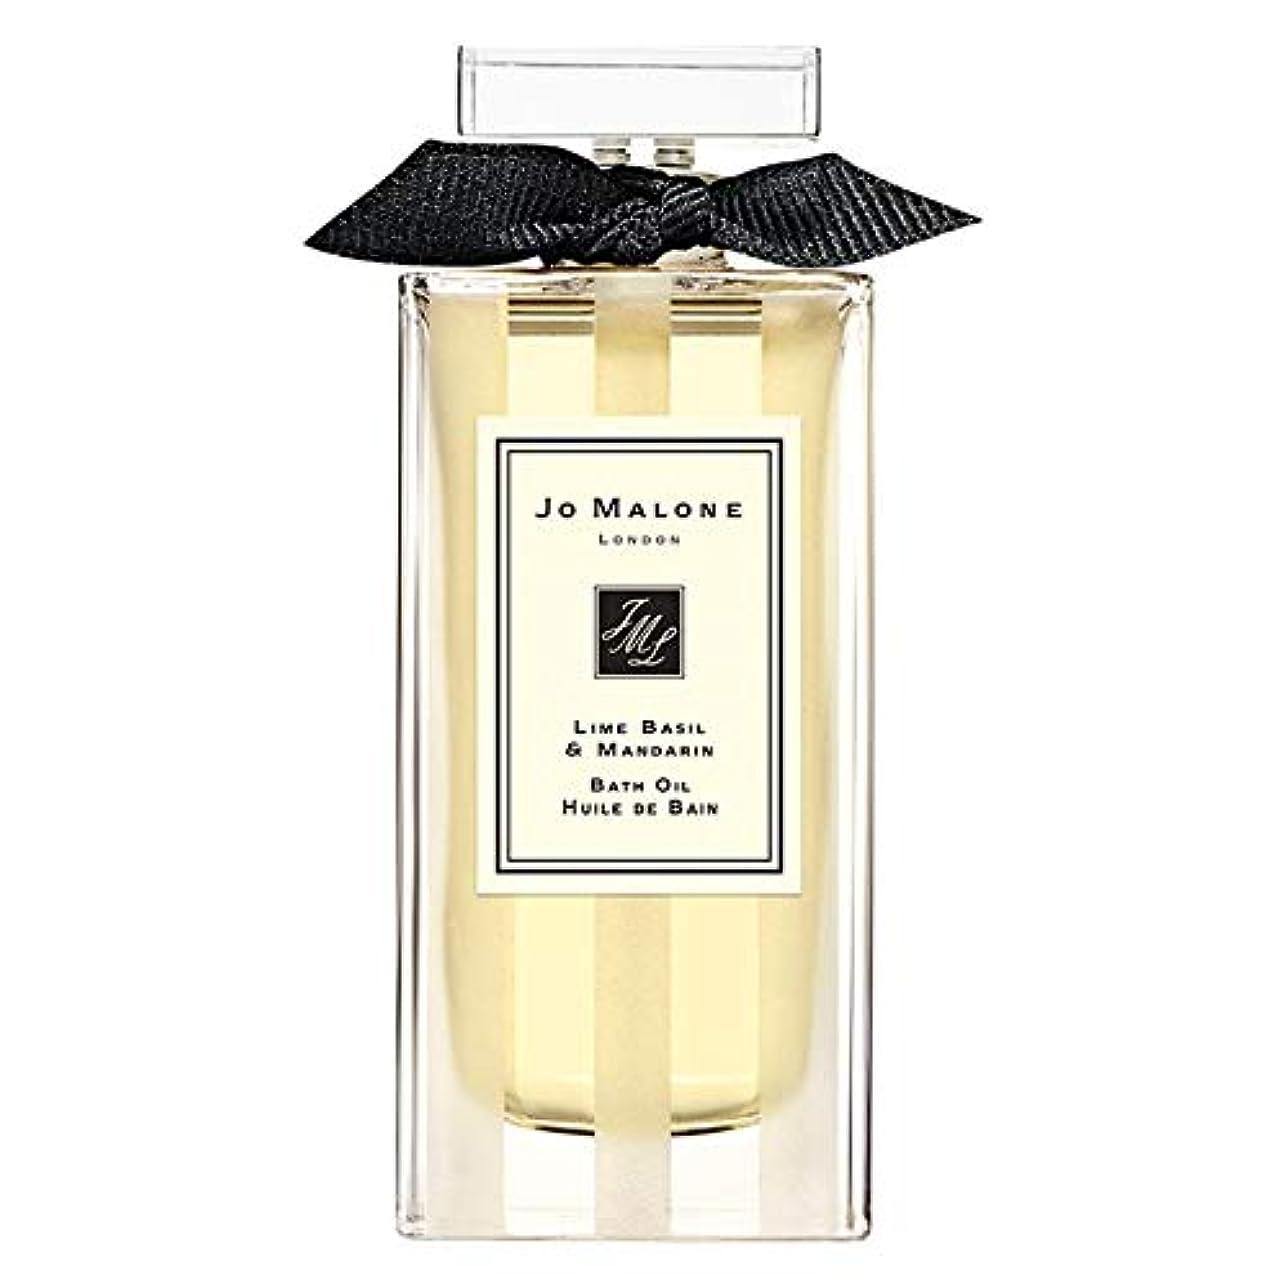 [Jo Malone ] ジョーマローンロンドンライムバジル&マンダリンバスオイル30ミリリットル - Jo Malone London Lime Basil & Mandarin Bath Oil 30ml [並行輸入品]